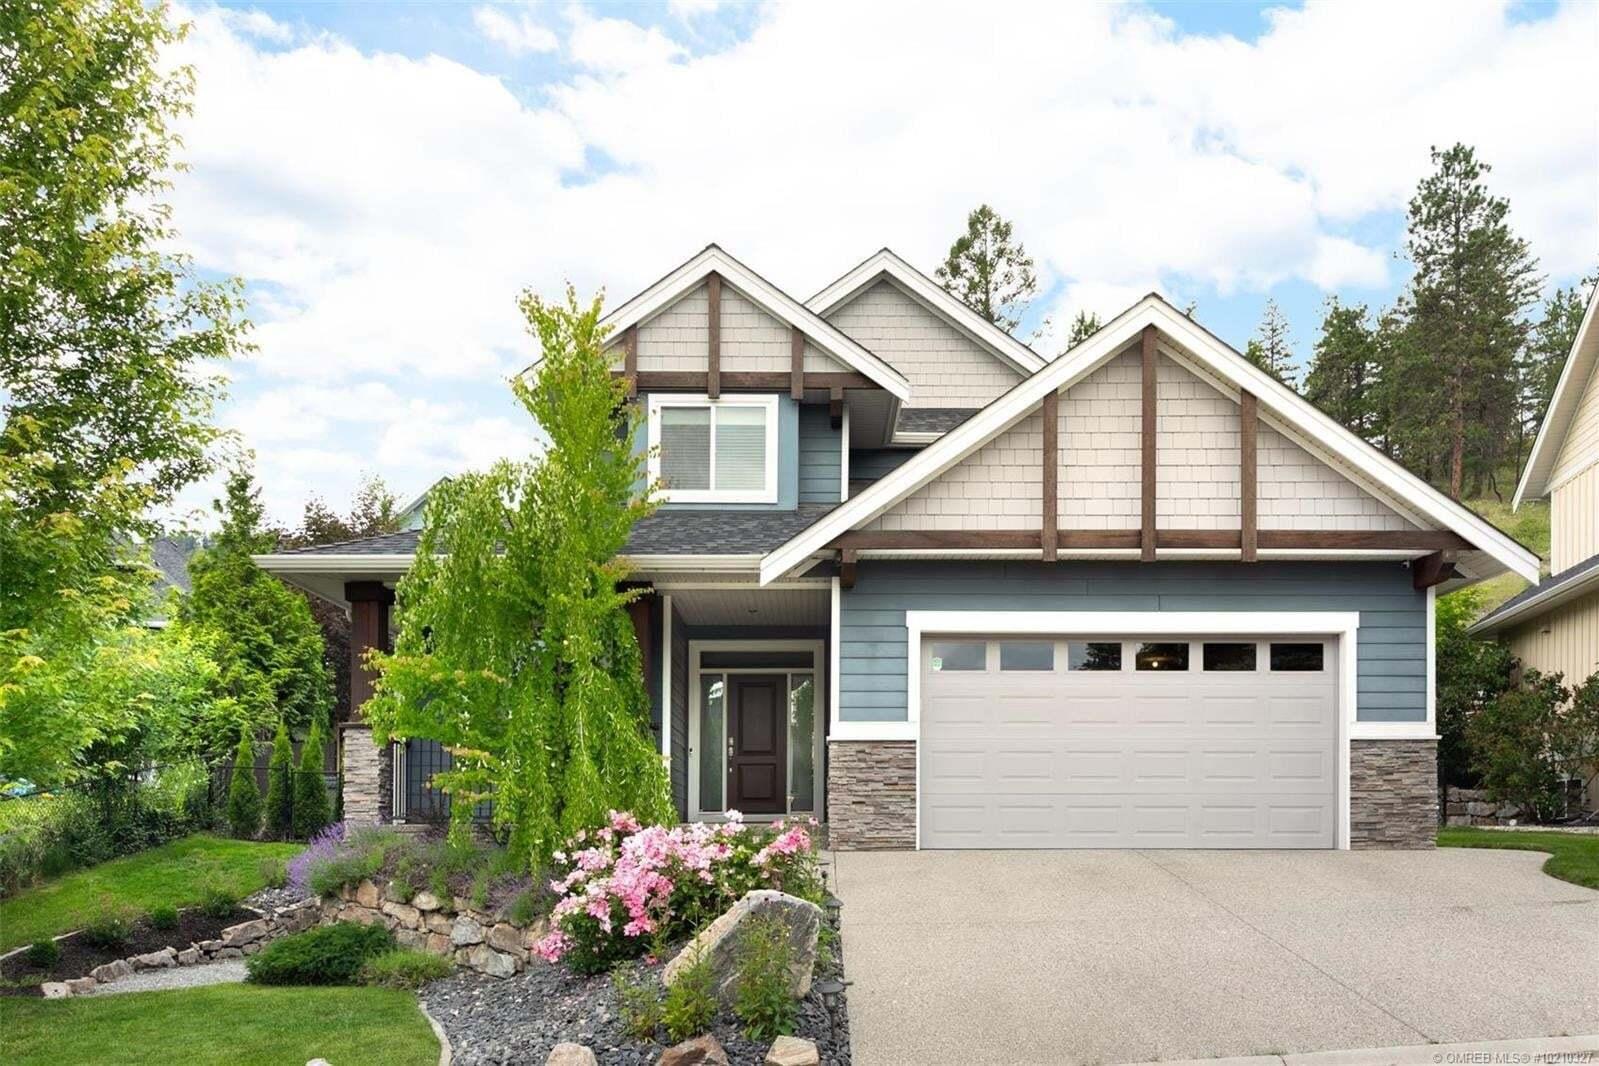 House for sale at 1314 Hidden Hills Dr Kelowna British Columbia - MLS: 10210327